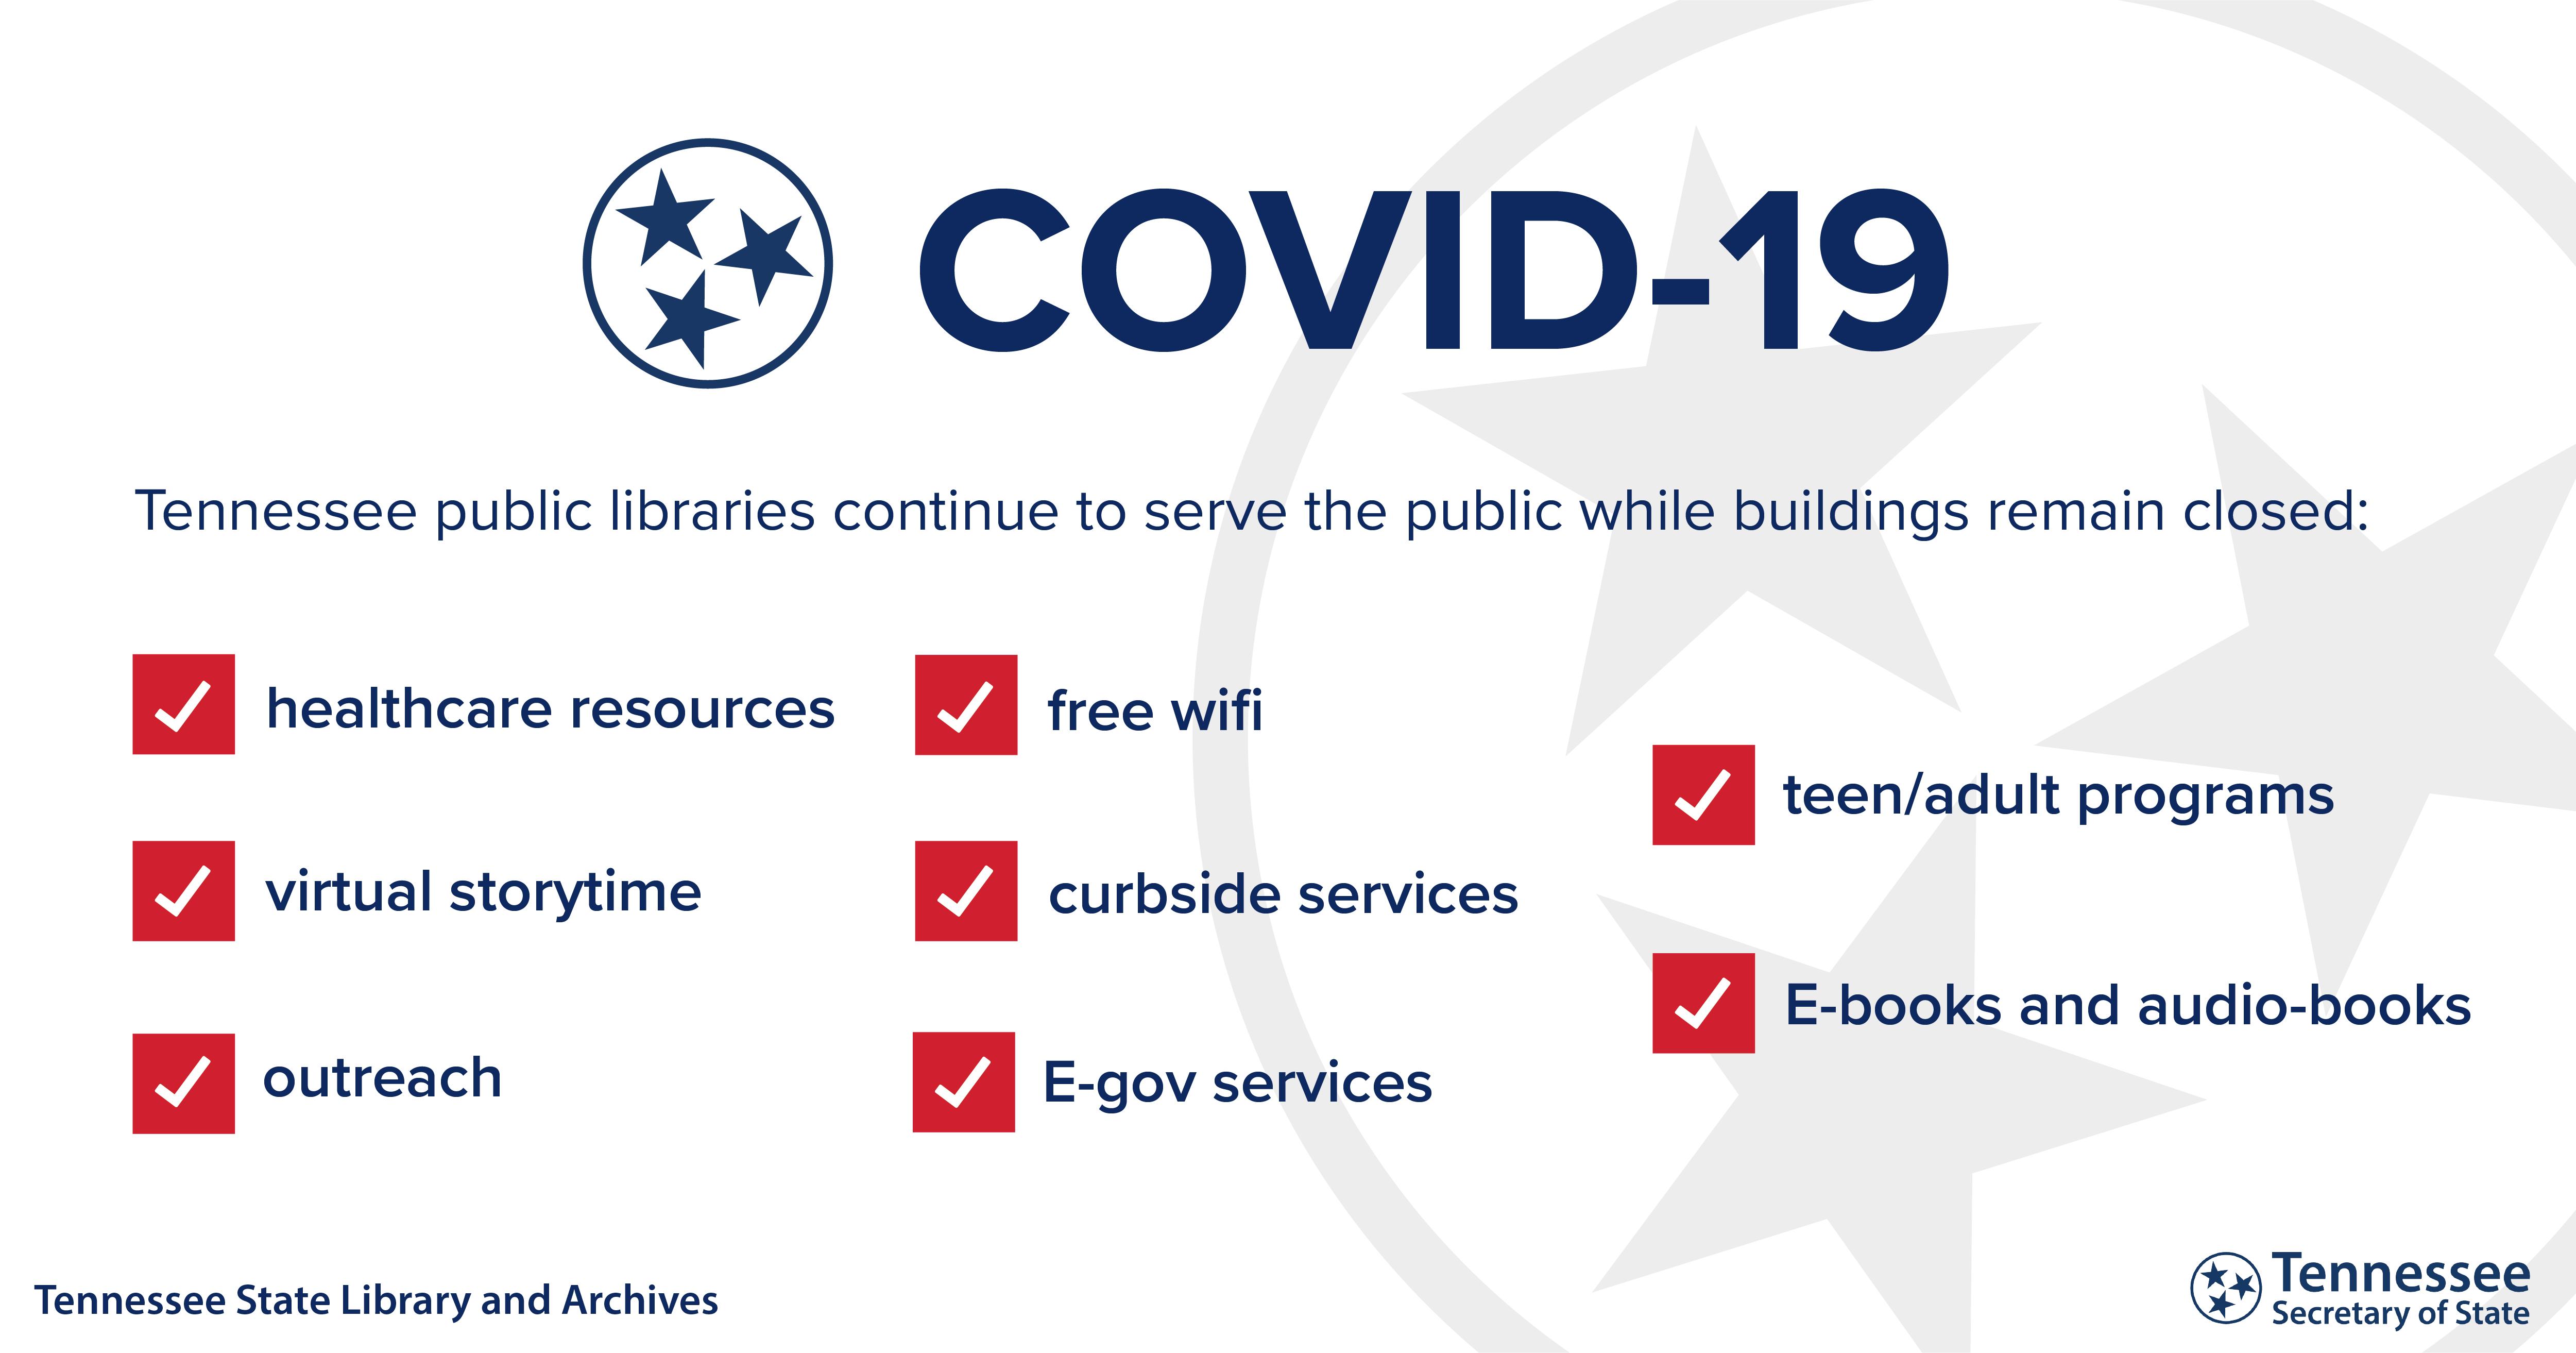 TN Public Libraries Continue to Serve Despite Closures